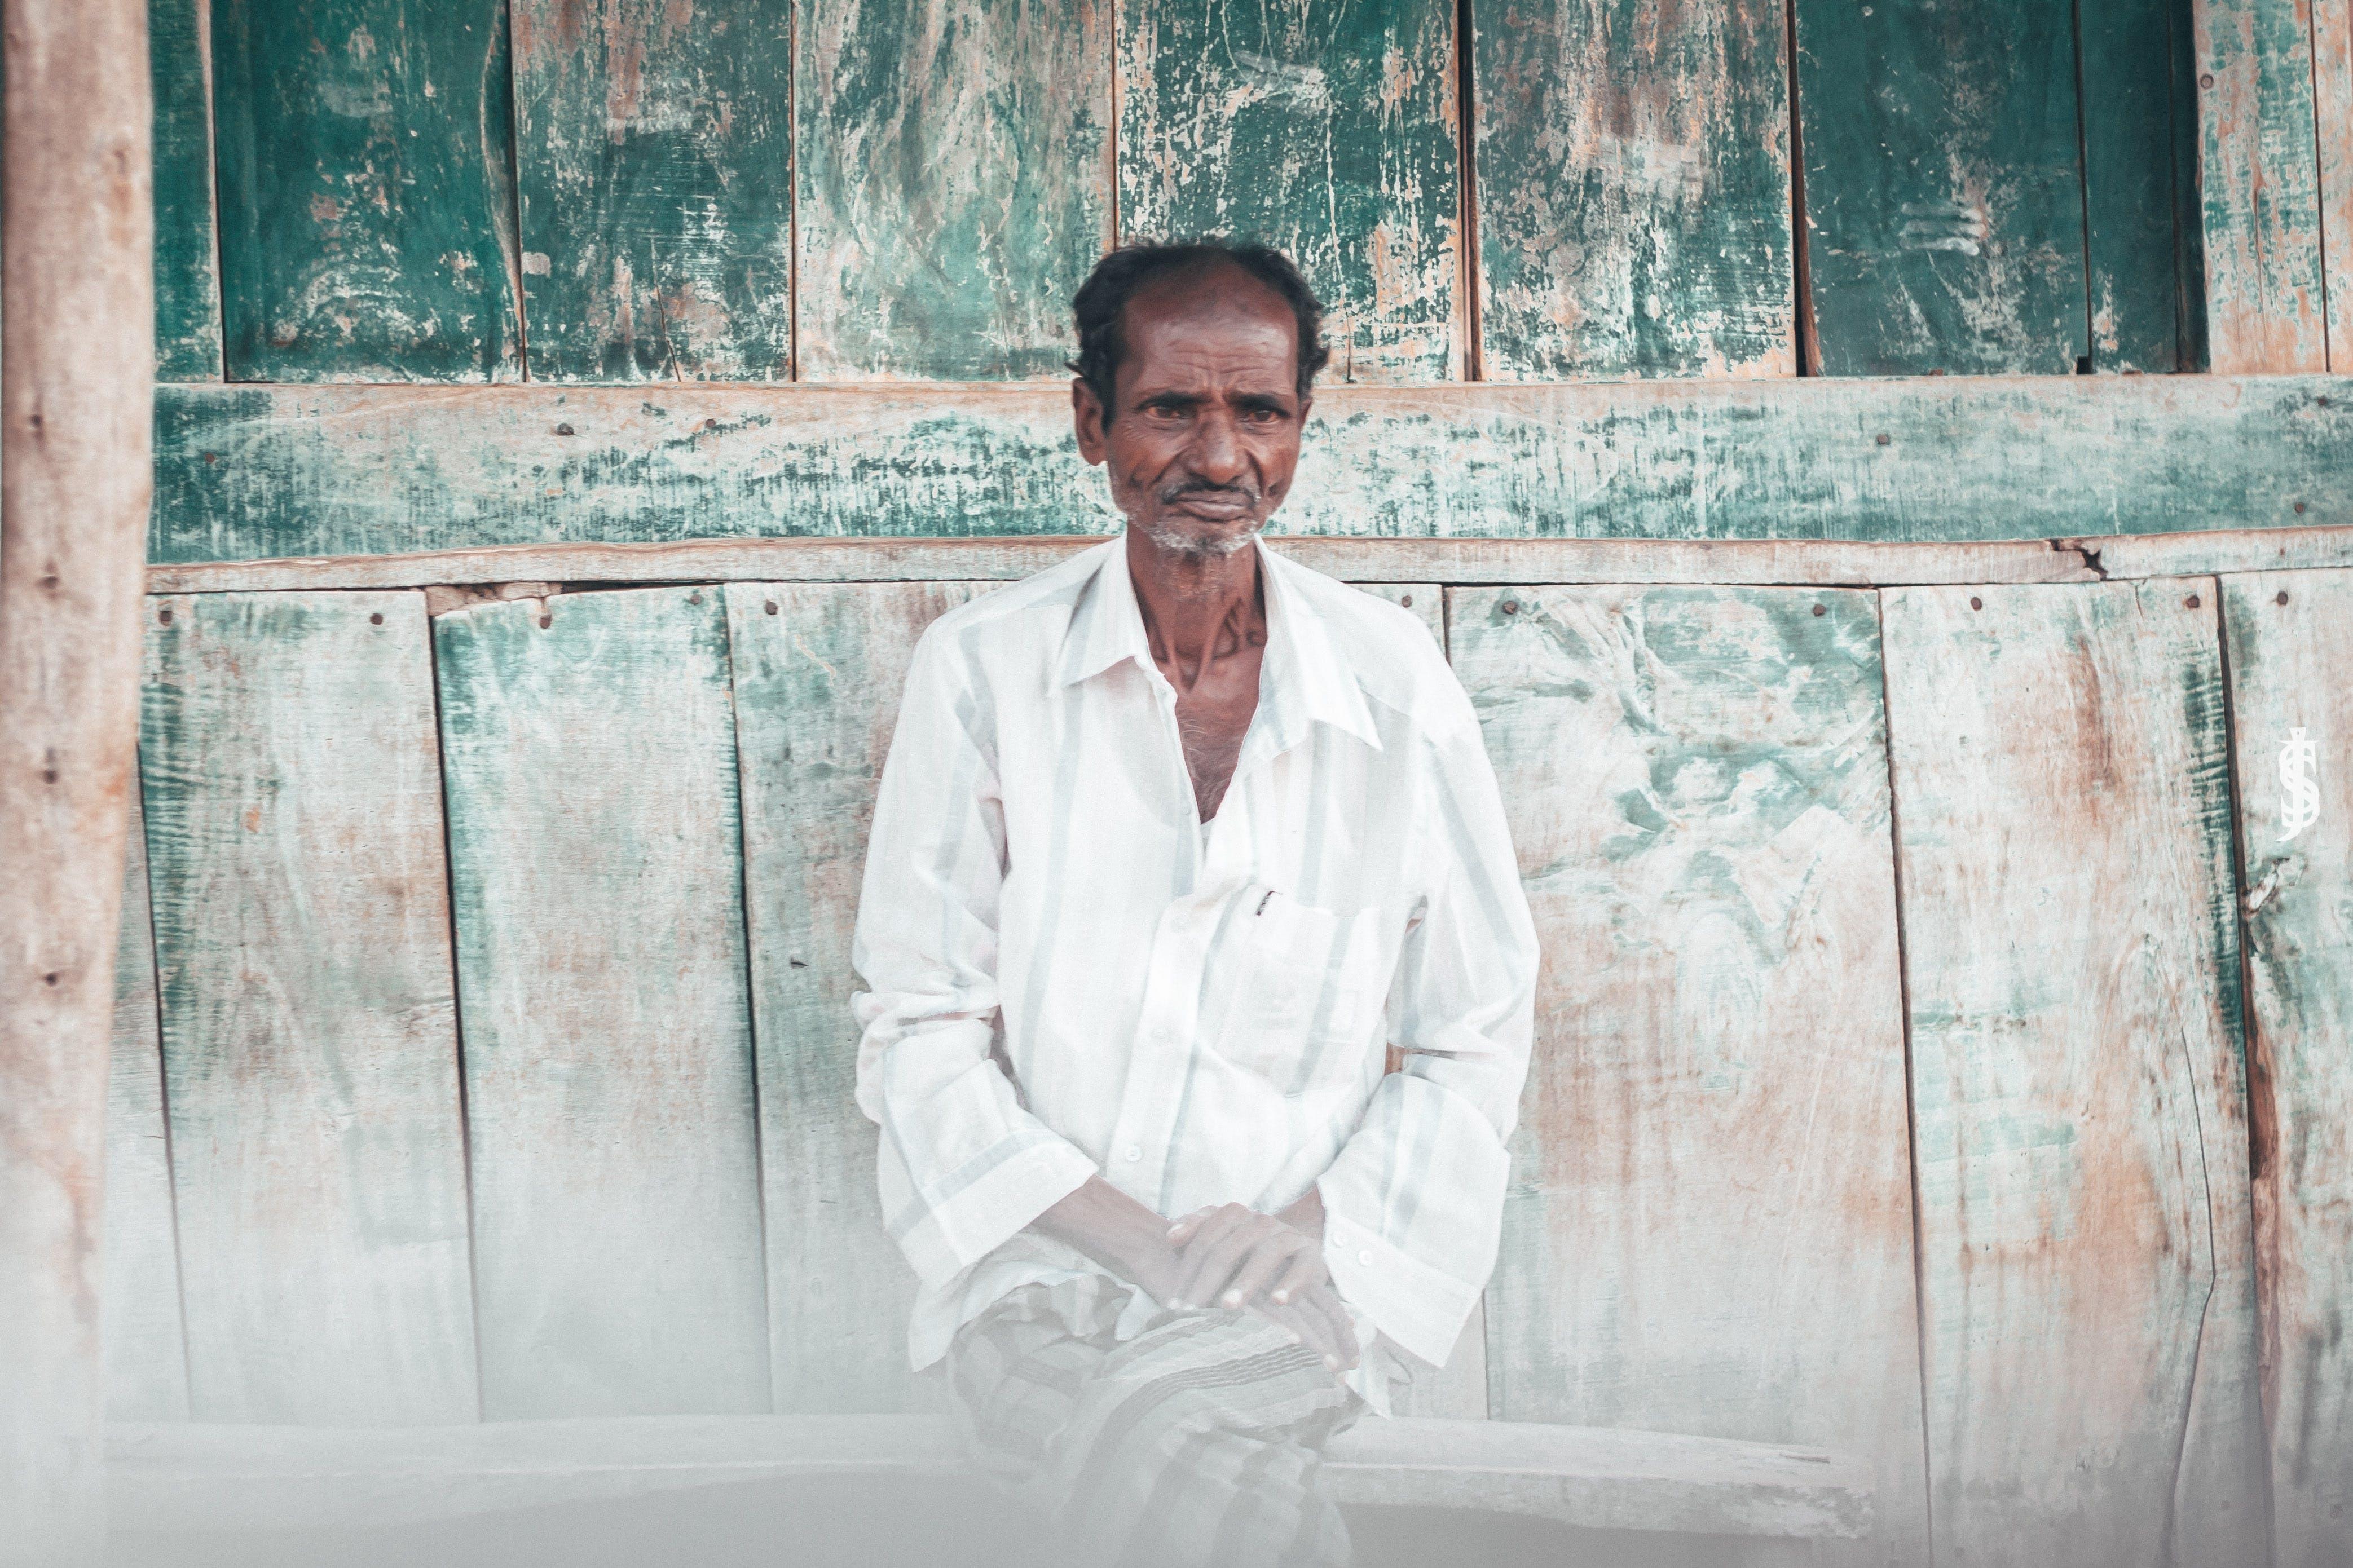 Man With Cross-legged Sitting on Bench